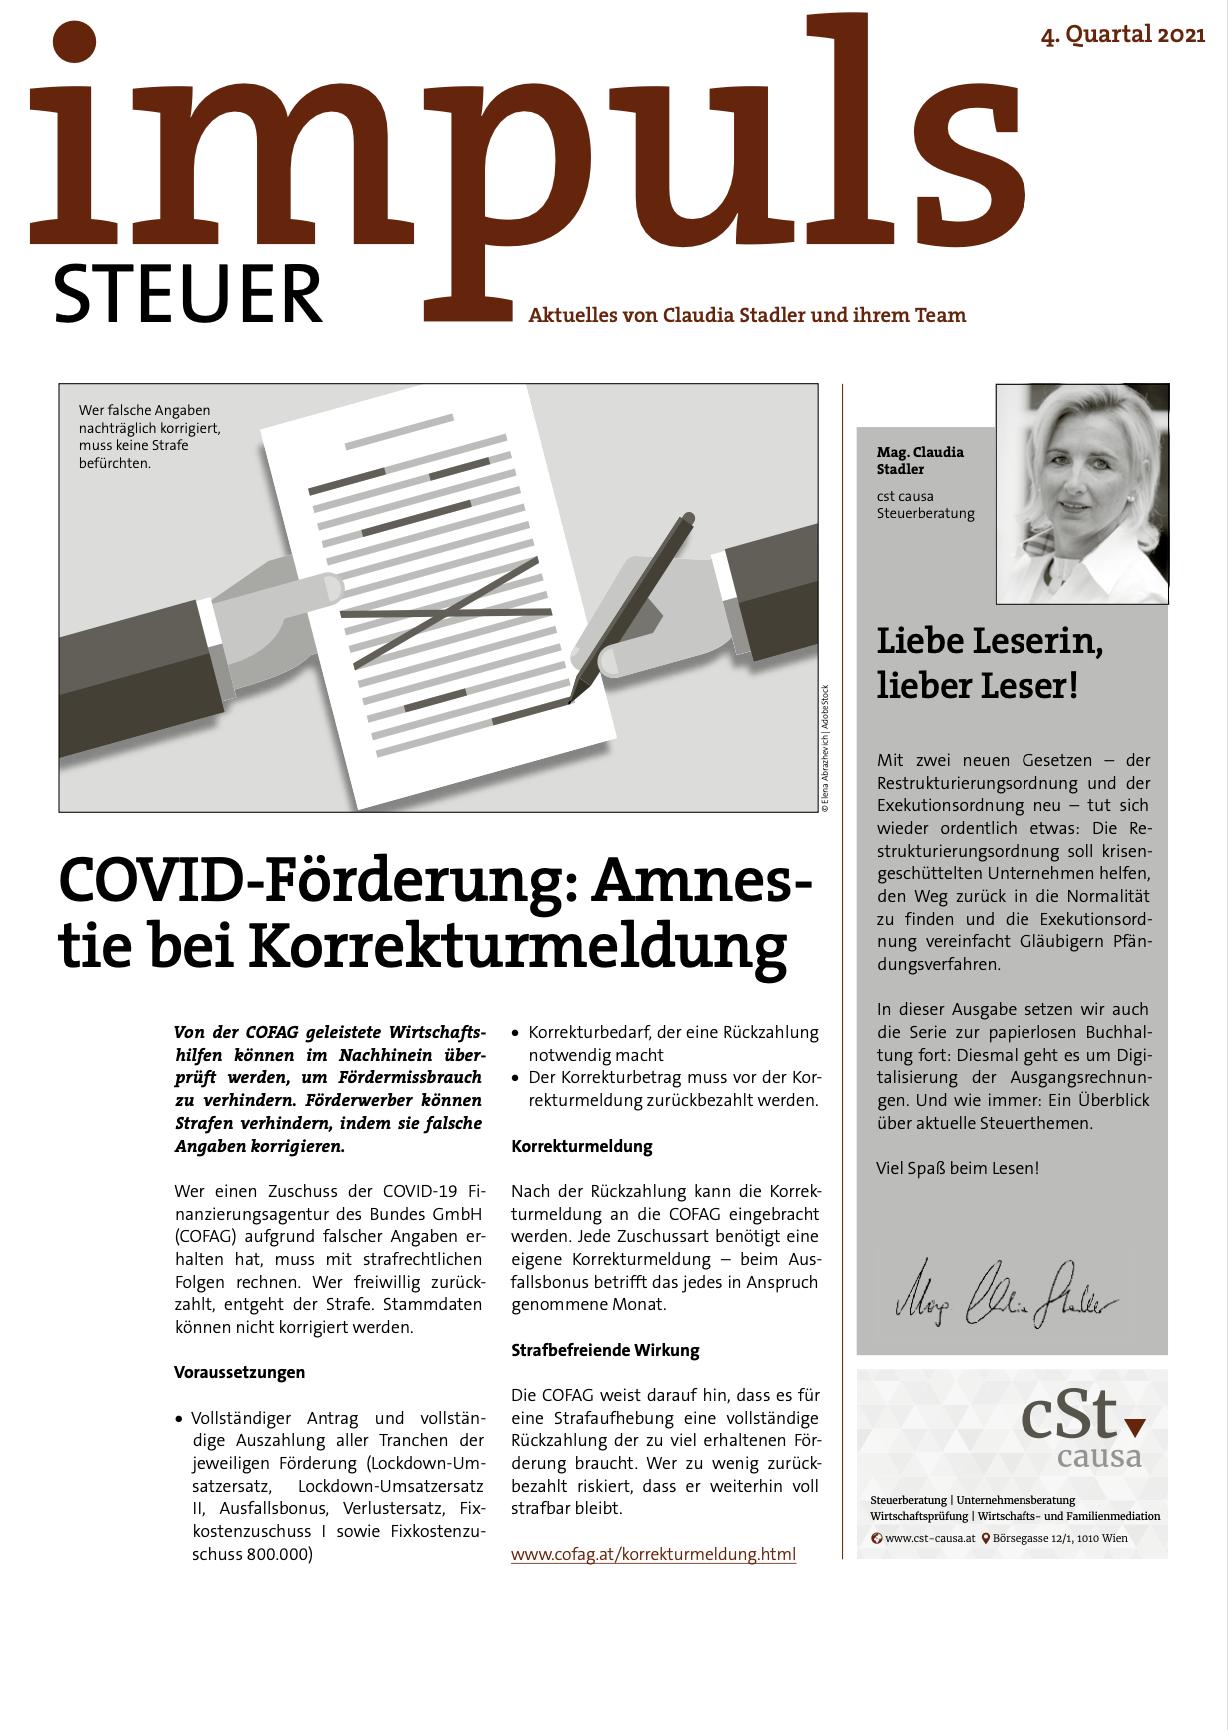 Kundenmagazin - Impuls Q4 2021 - cSt causa